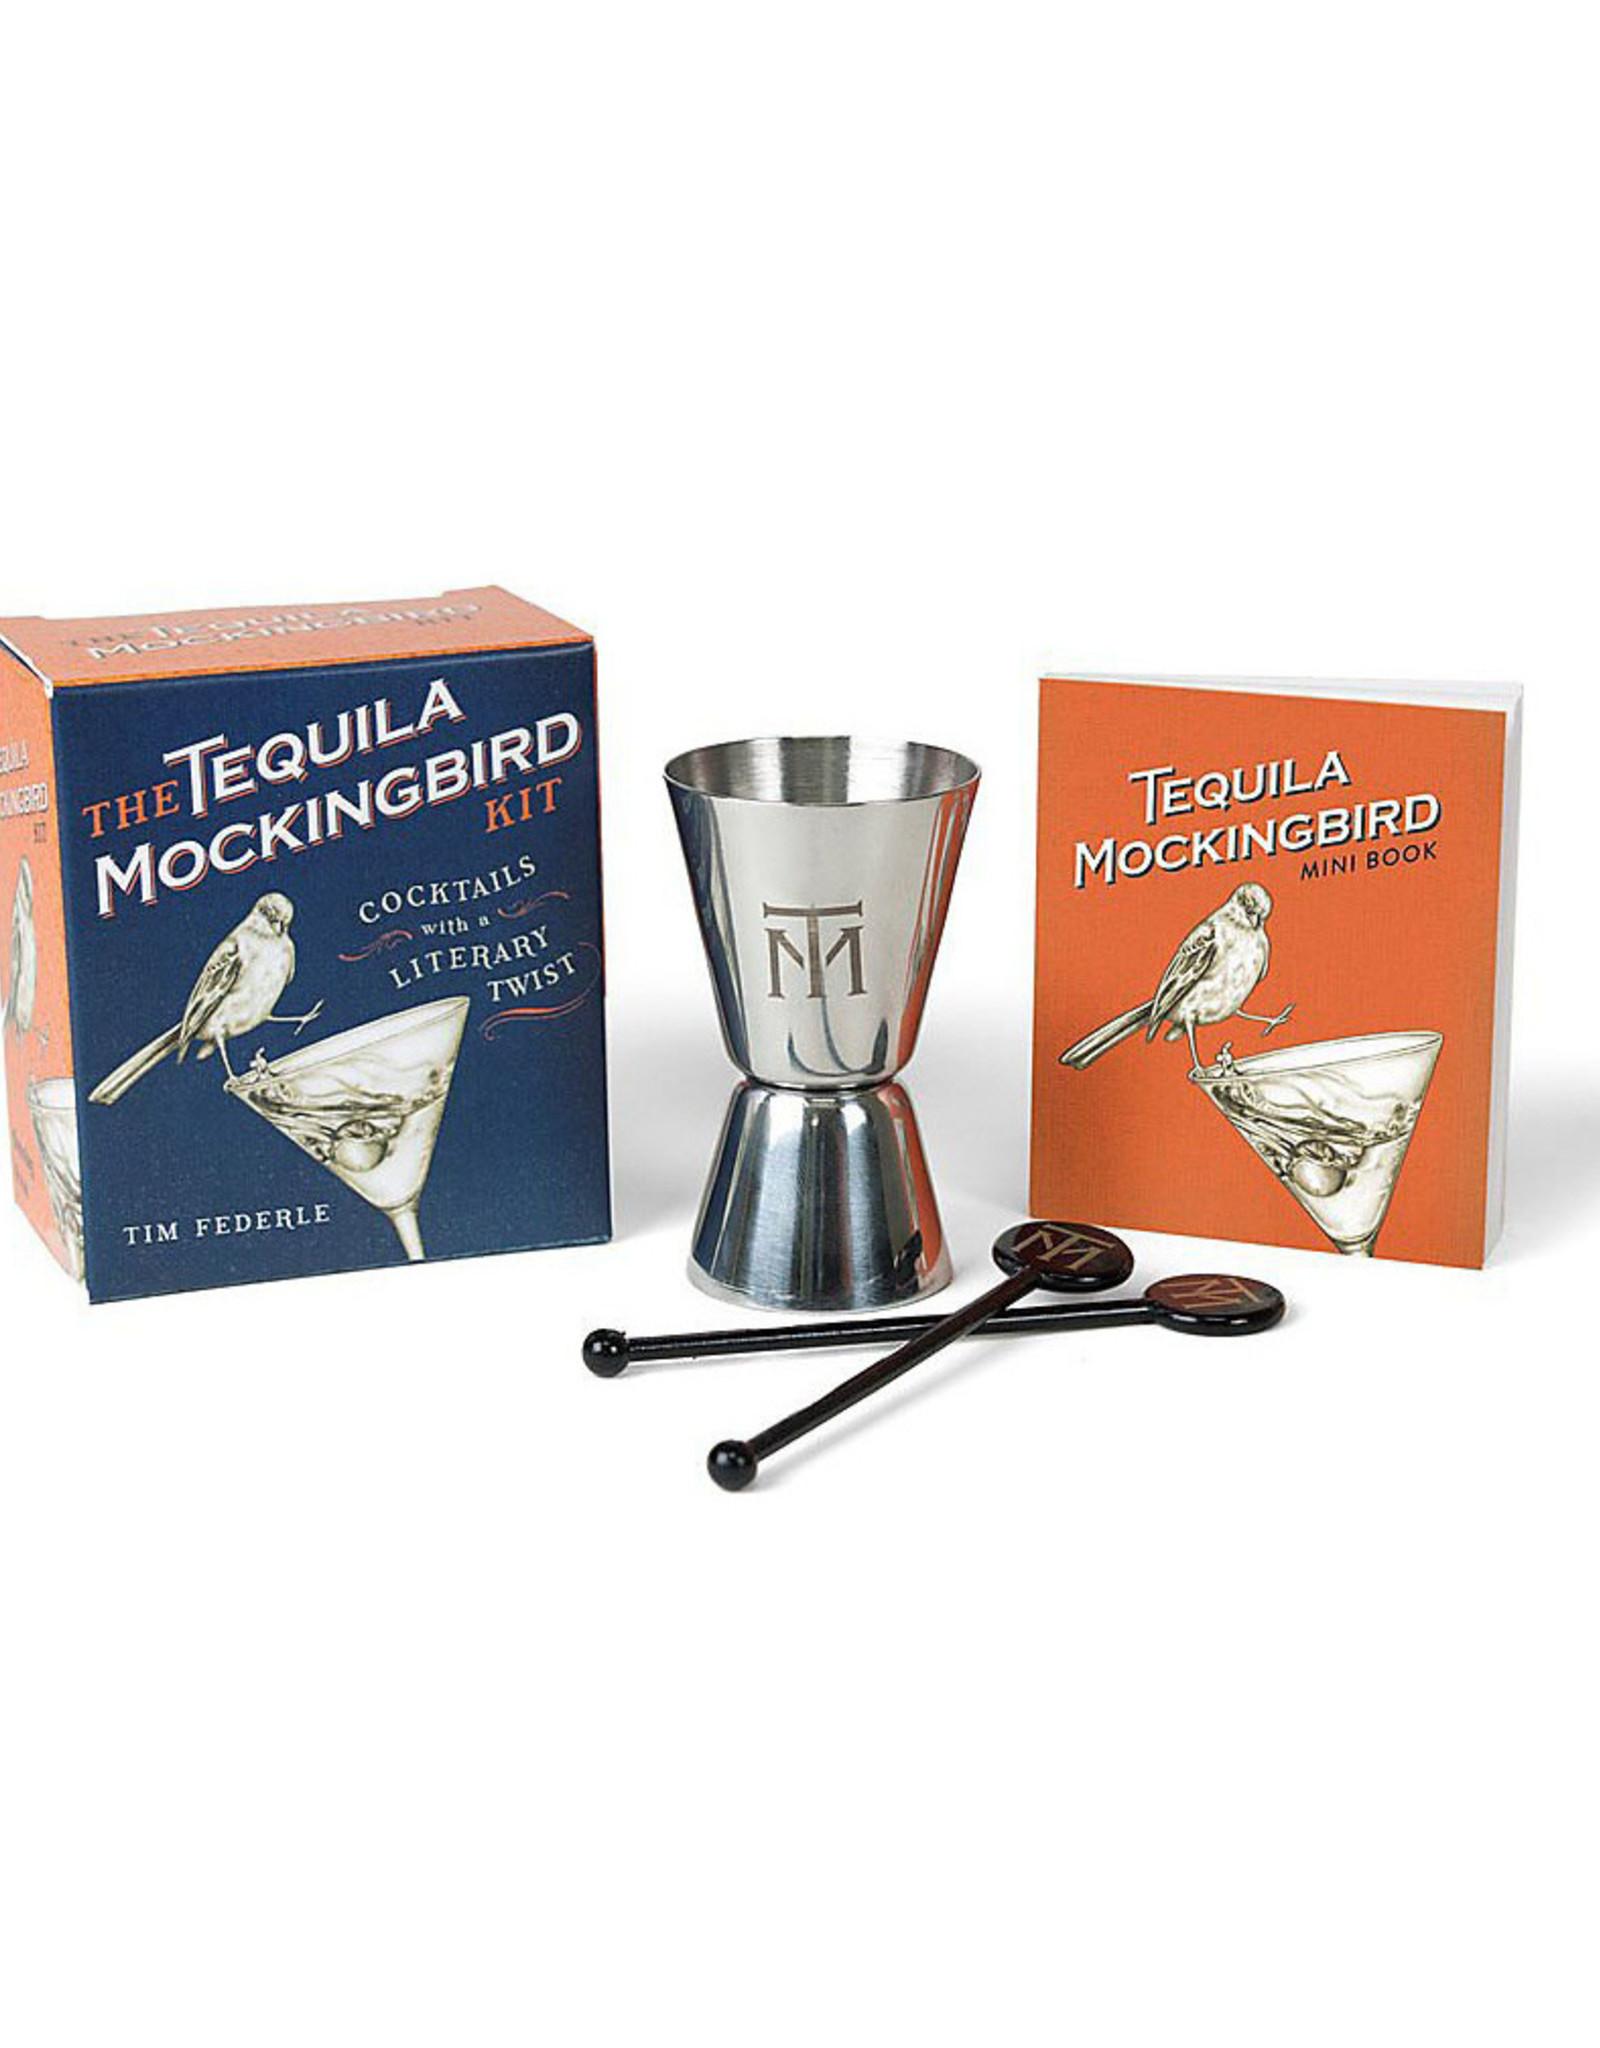 The Tequila Mockingbird Kit